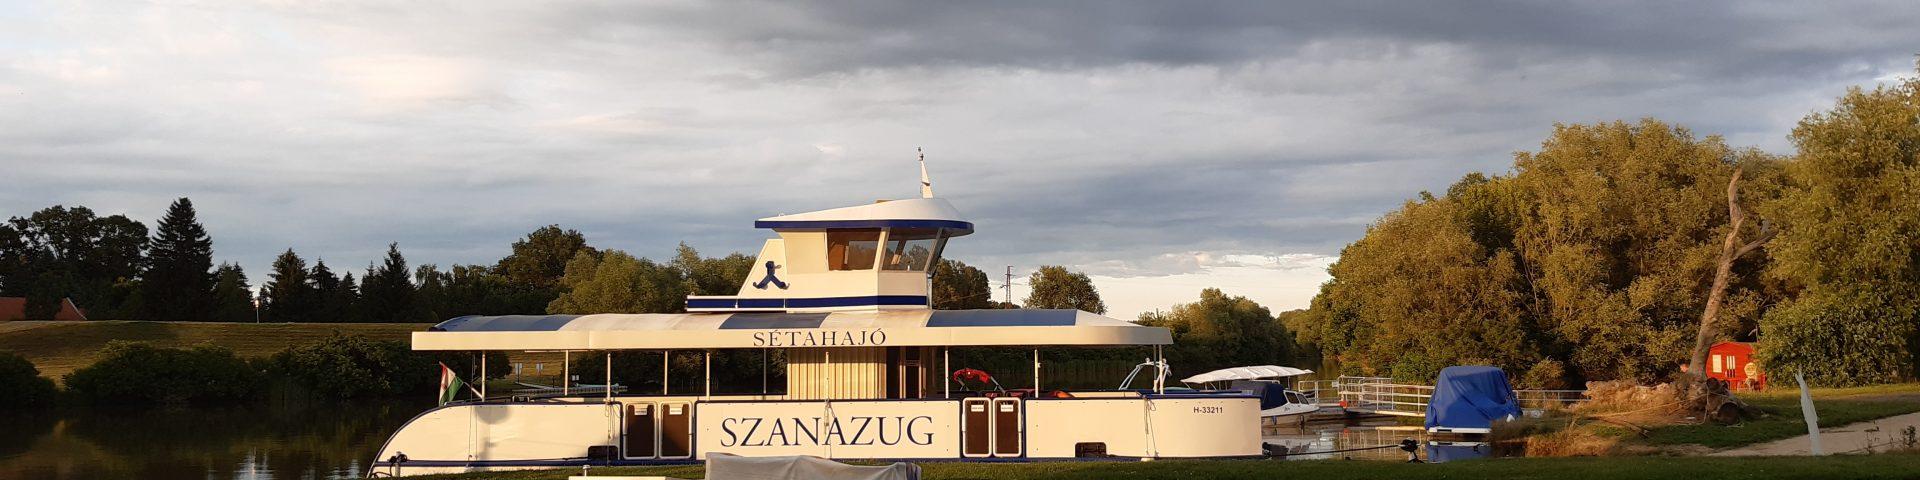 Szanazug